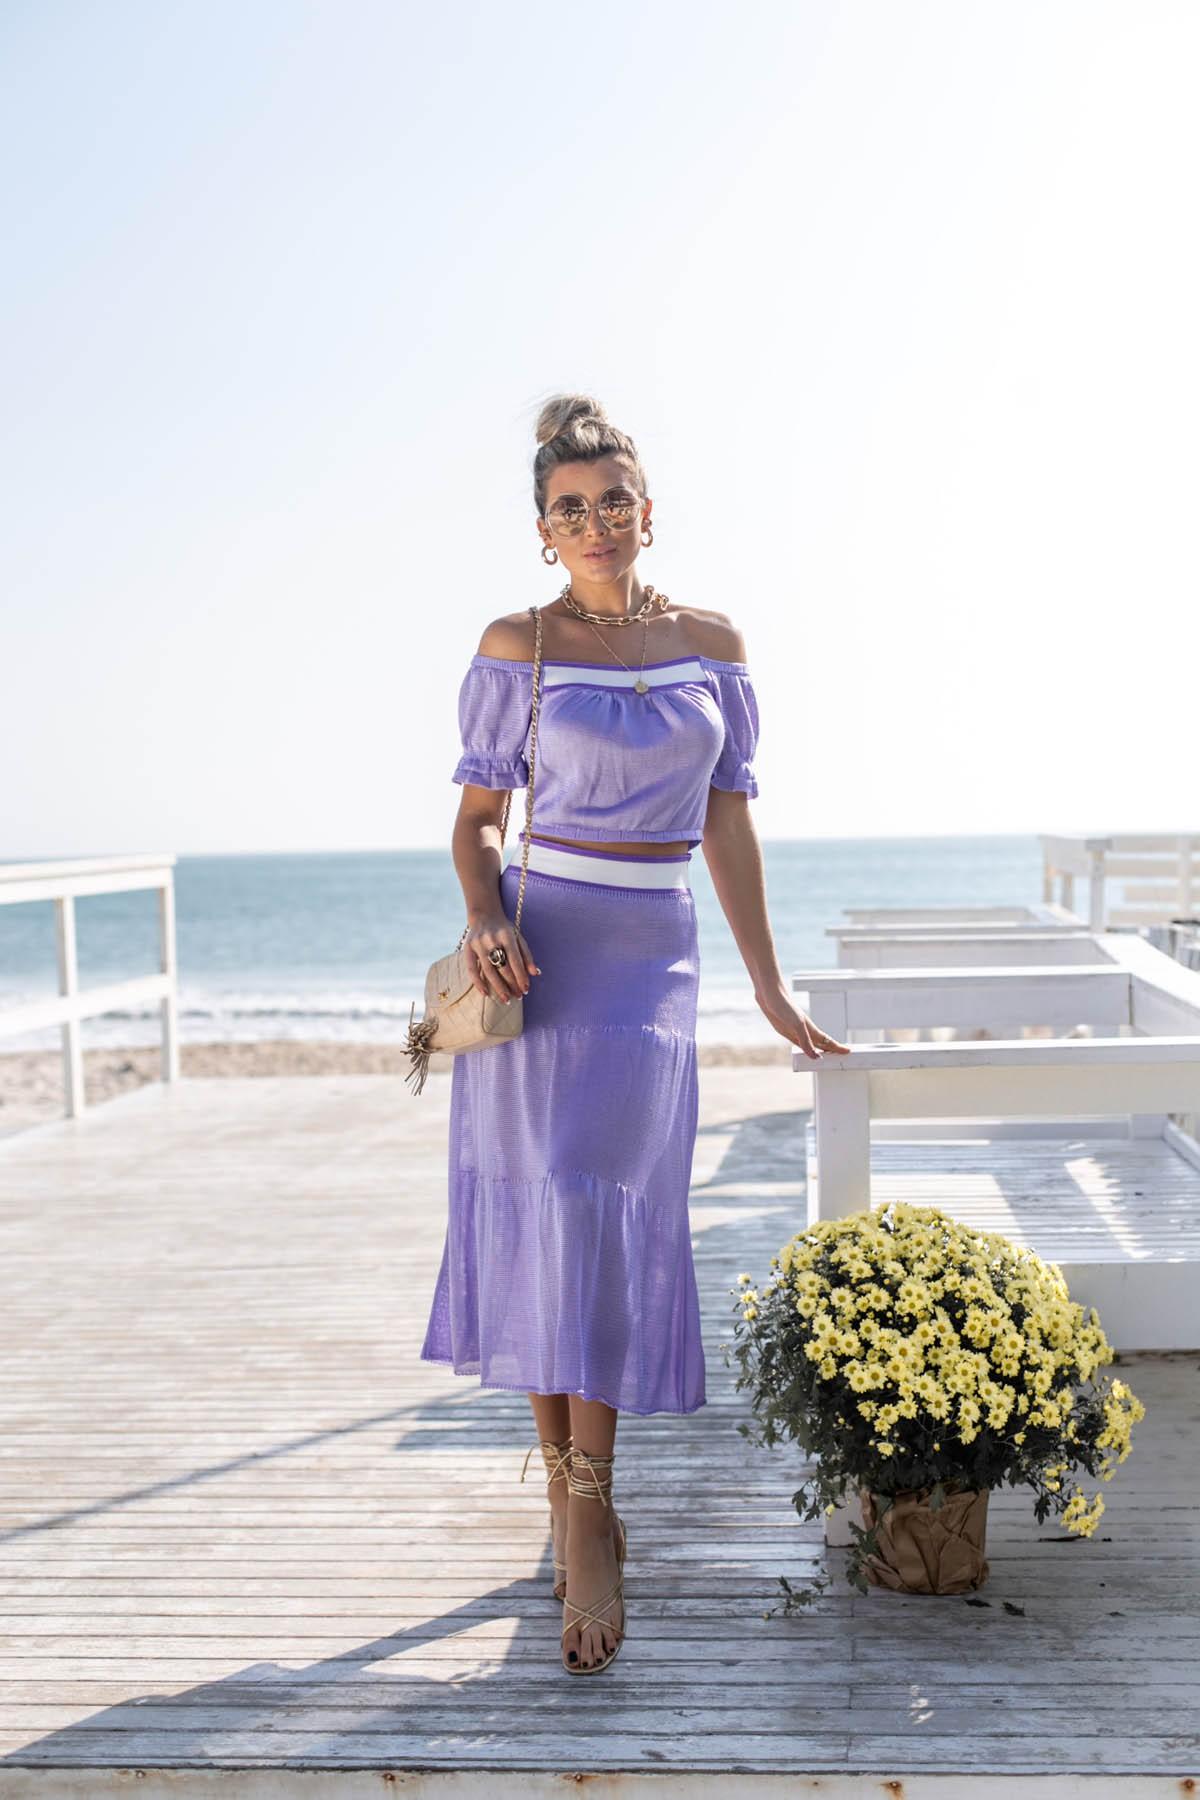 Saia Midi Hortência Vera Tricot Feminino Roxo / lilás / Branco